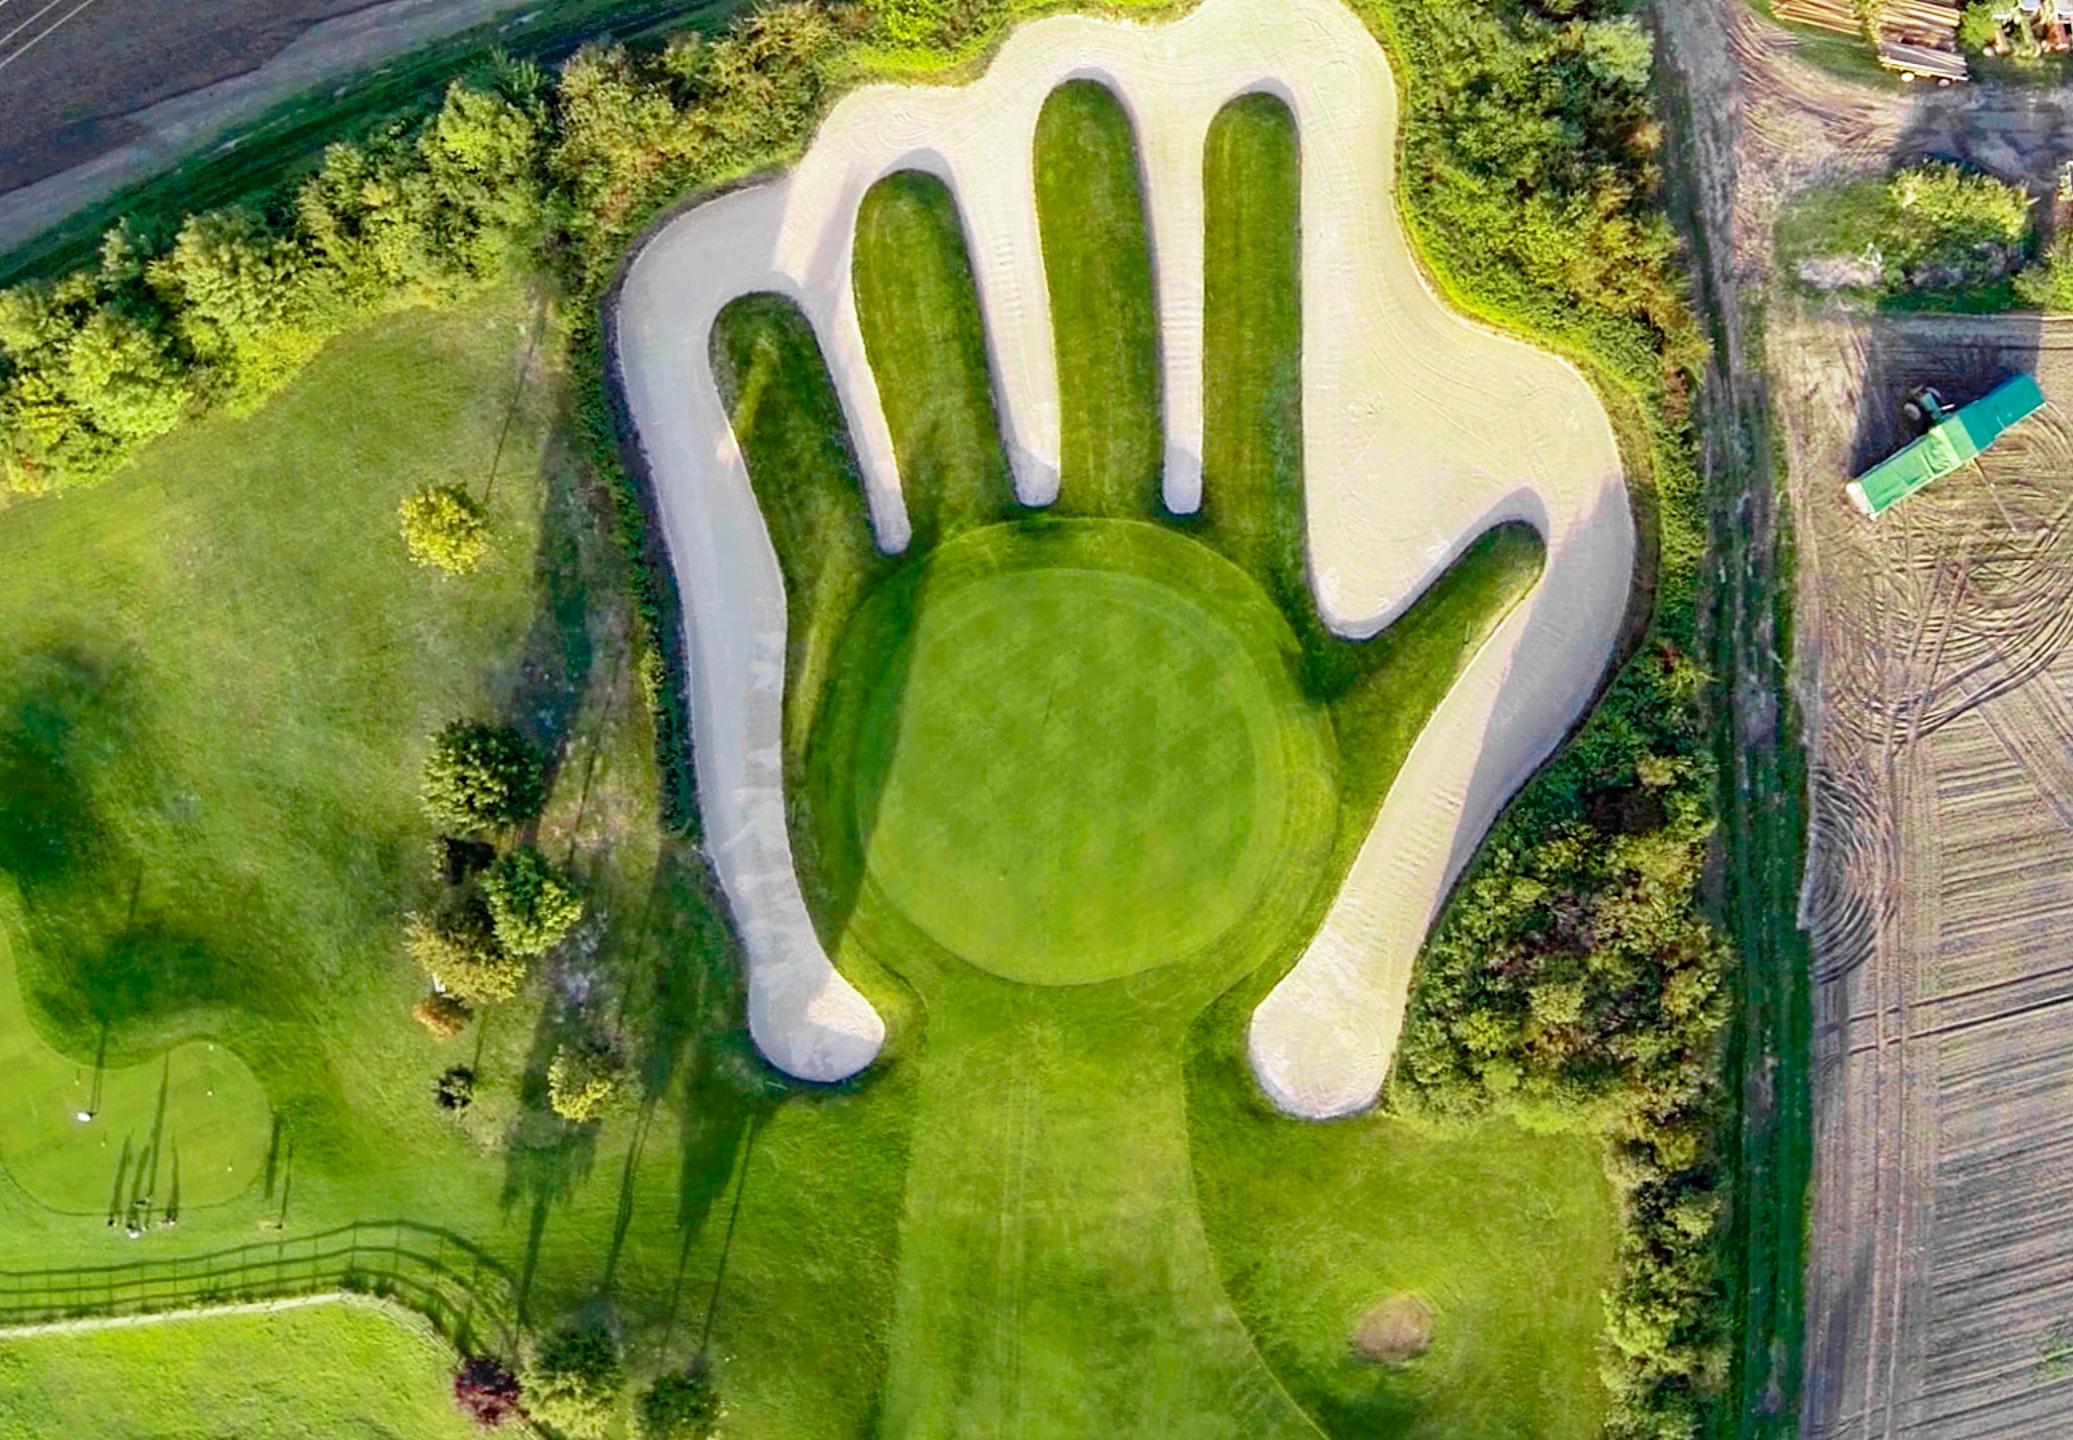 Golf Absolute by Markus Heisler